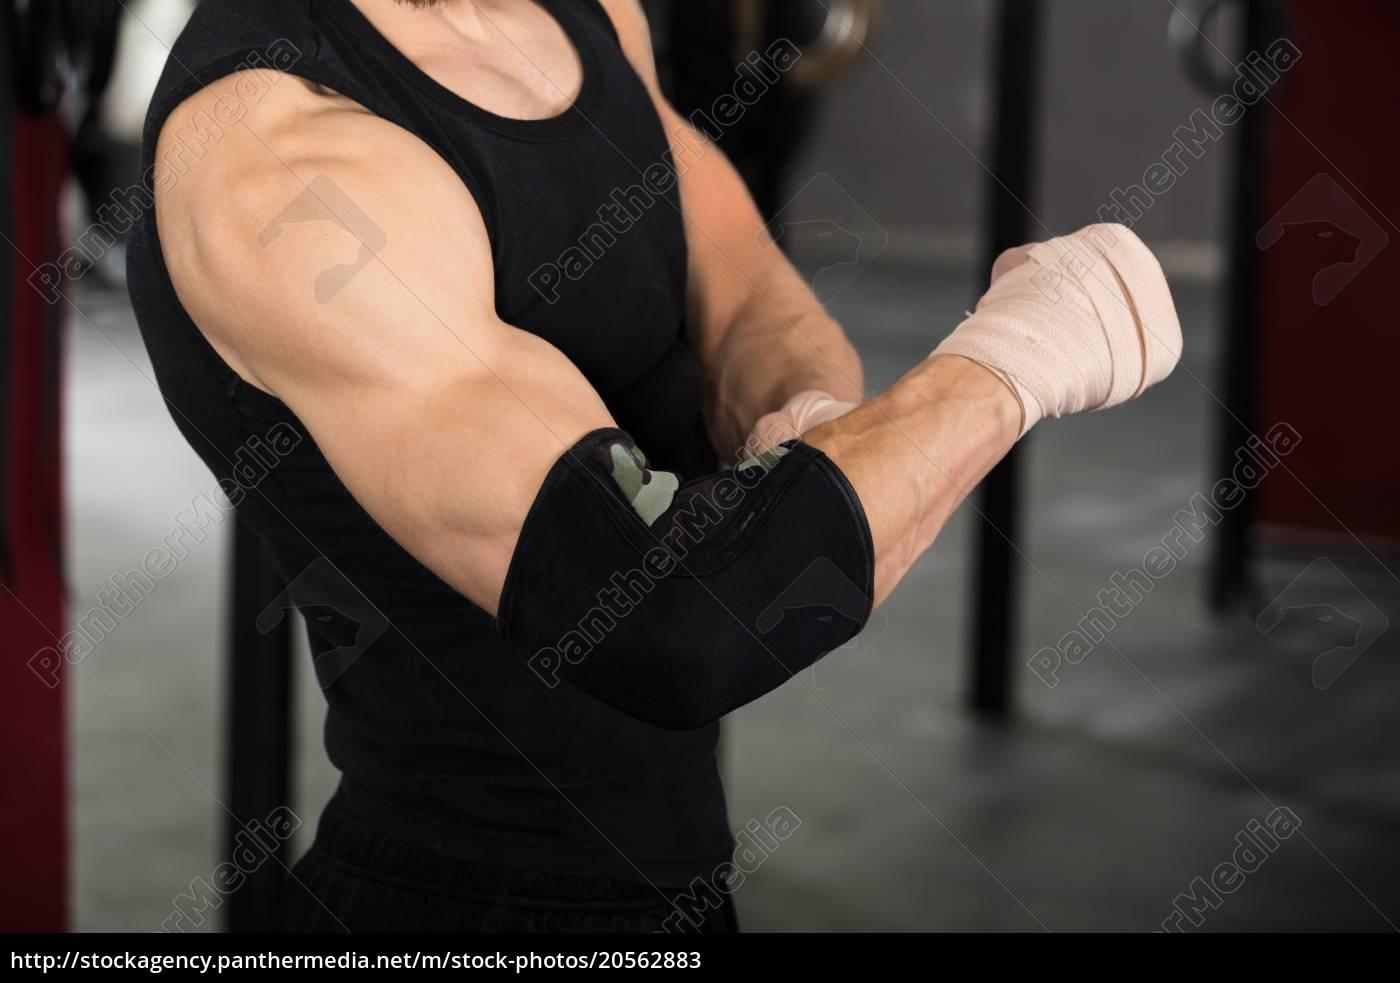 athlete, person, wearing, bandage, on, elbow - 20562883